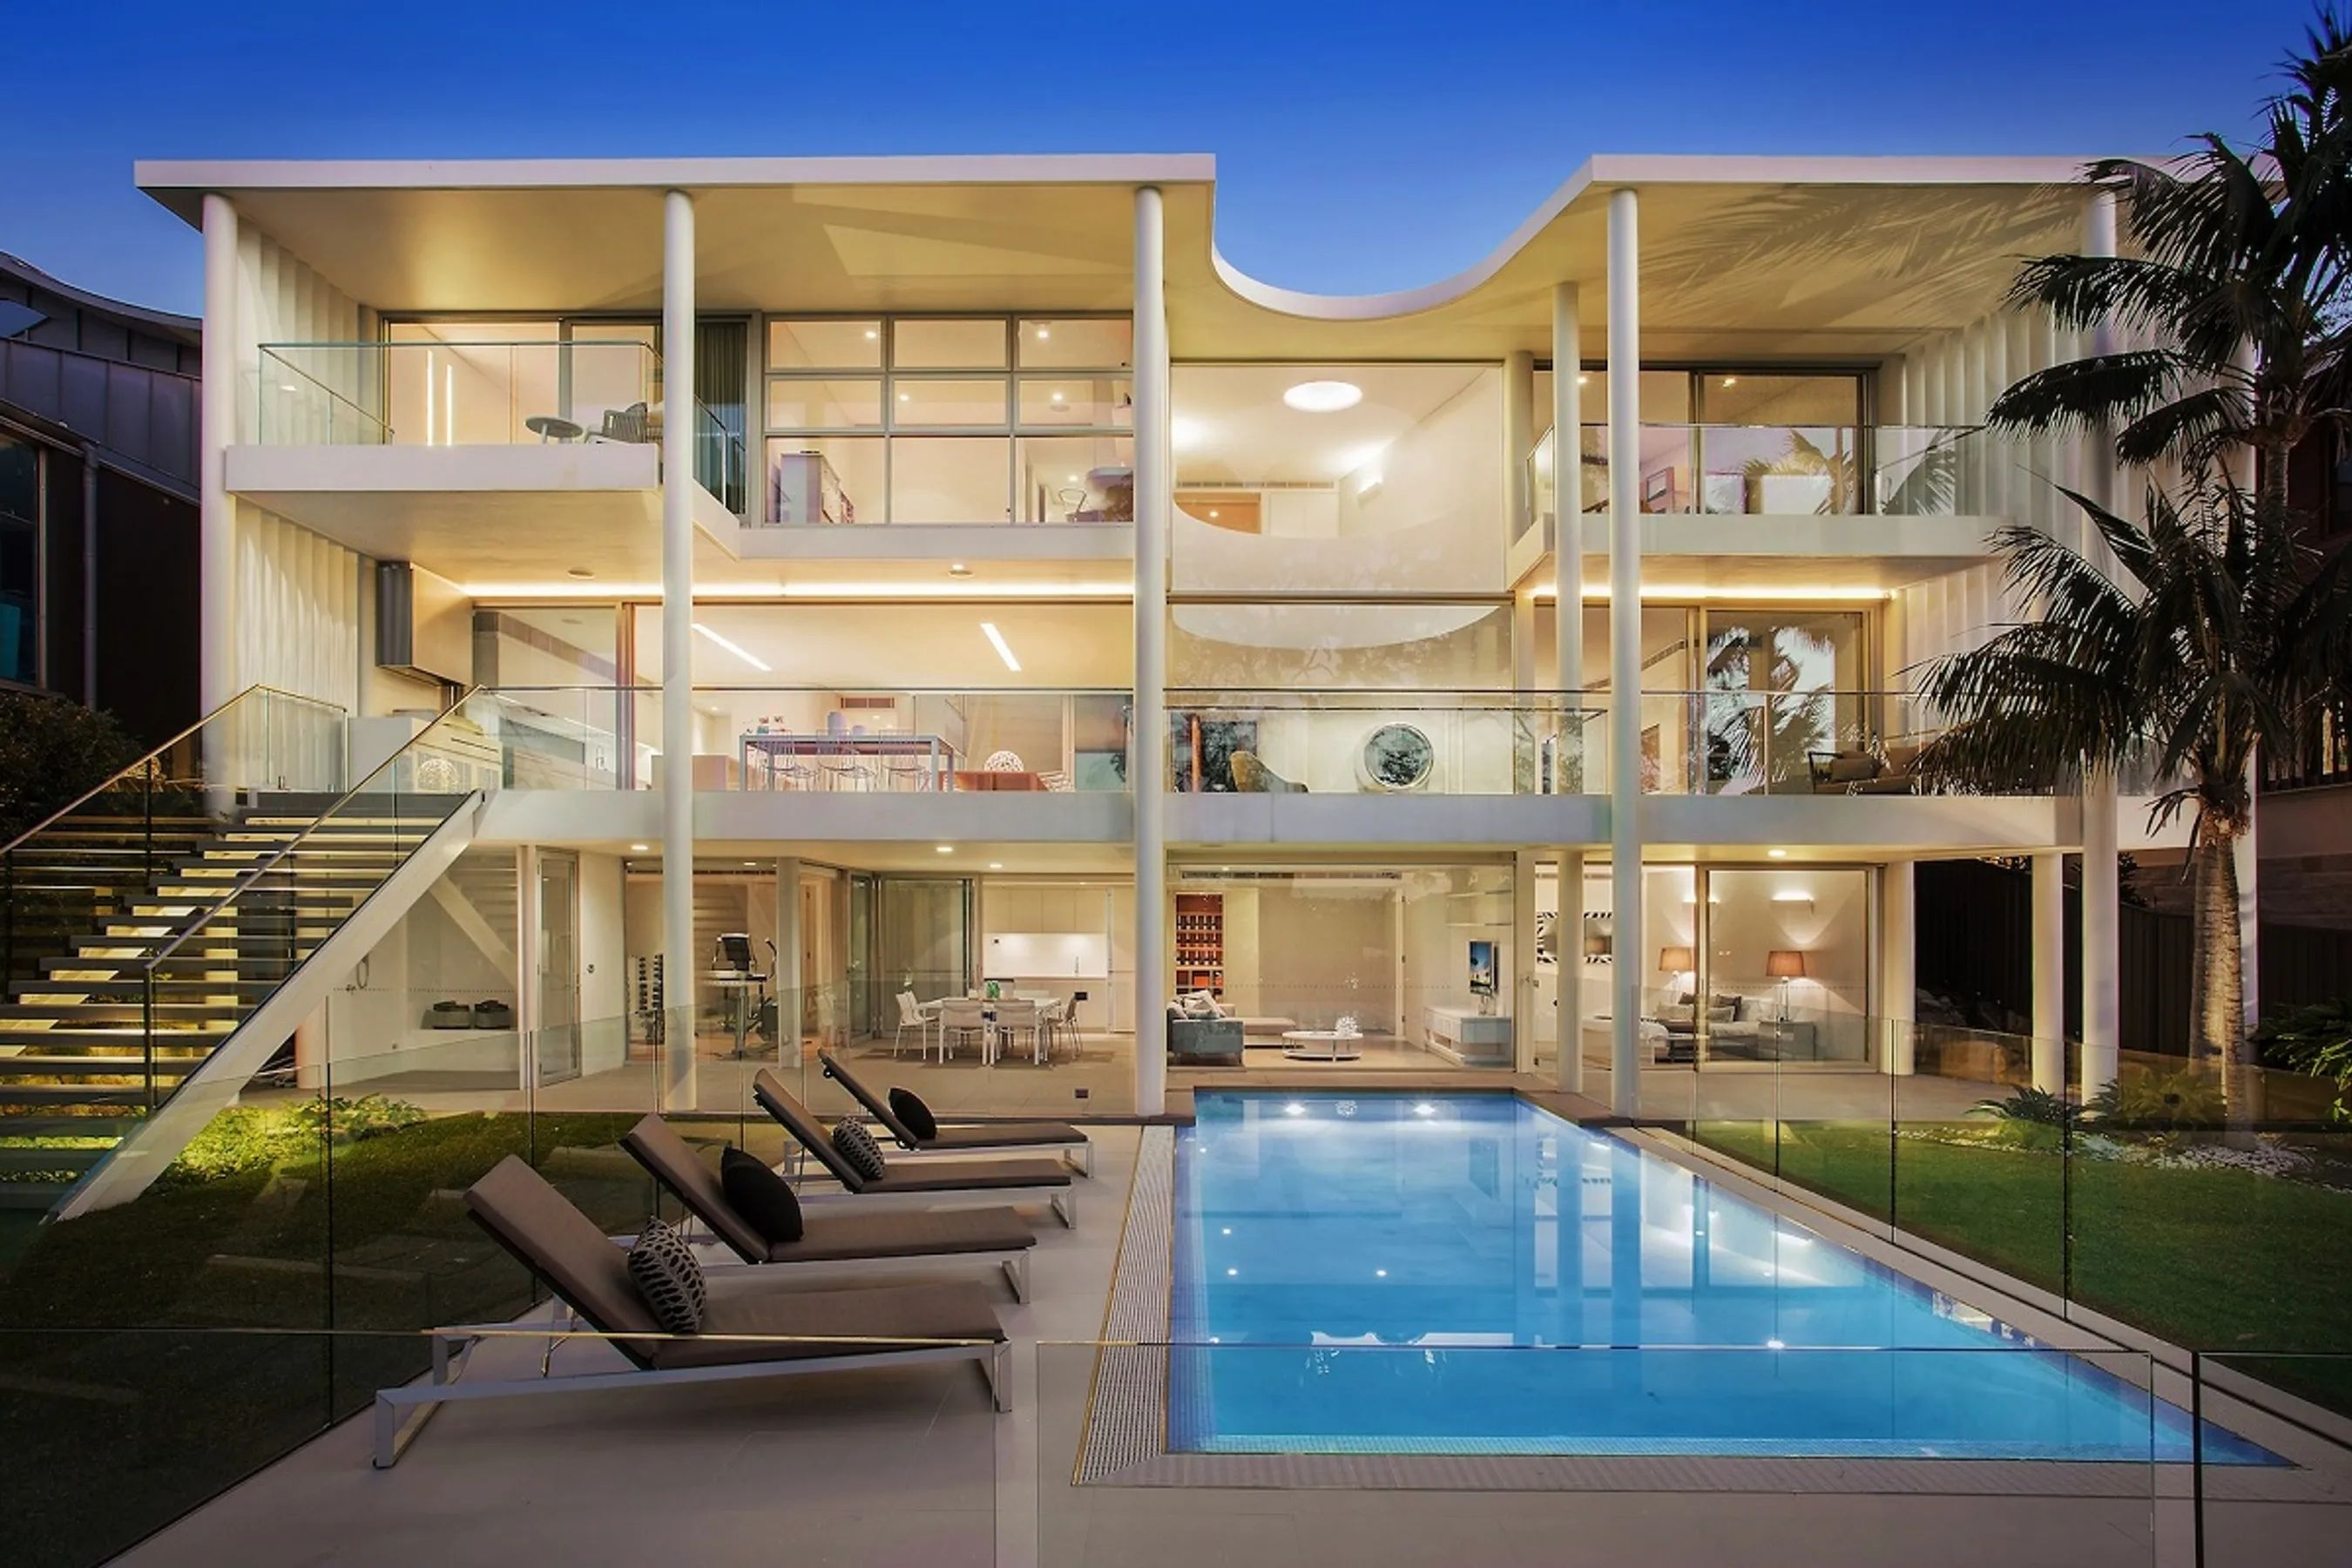 Oceania - Australia - New south wales area - Sydney area - Balmoral Beach Estate - Image 1/20